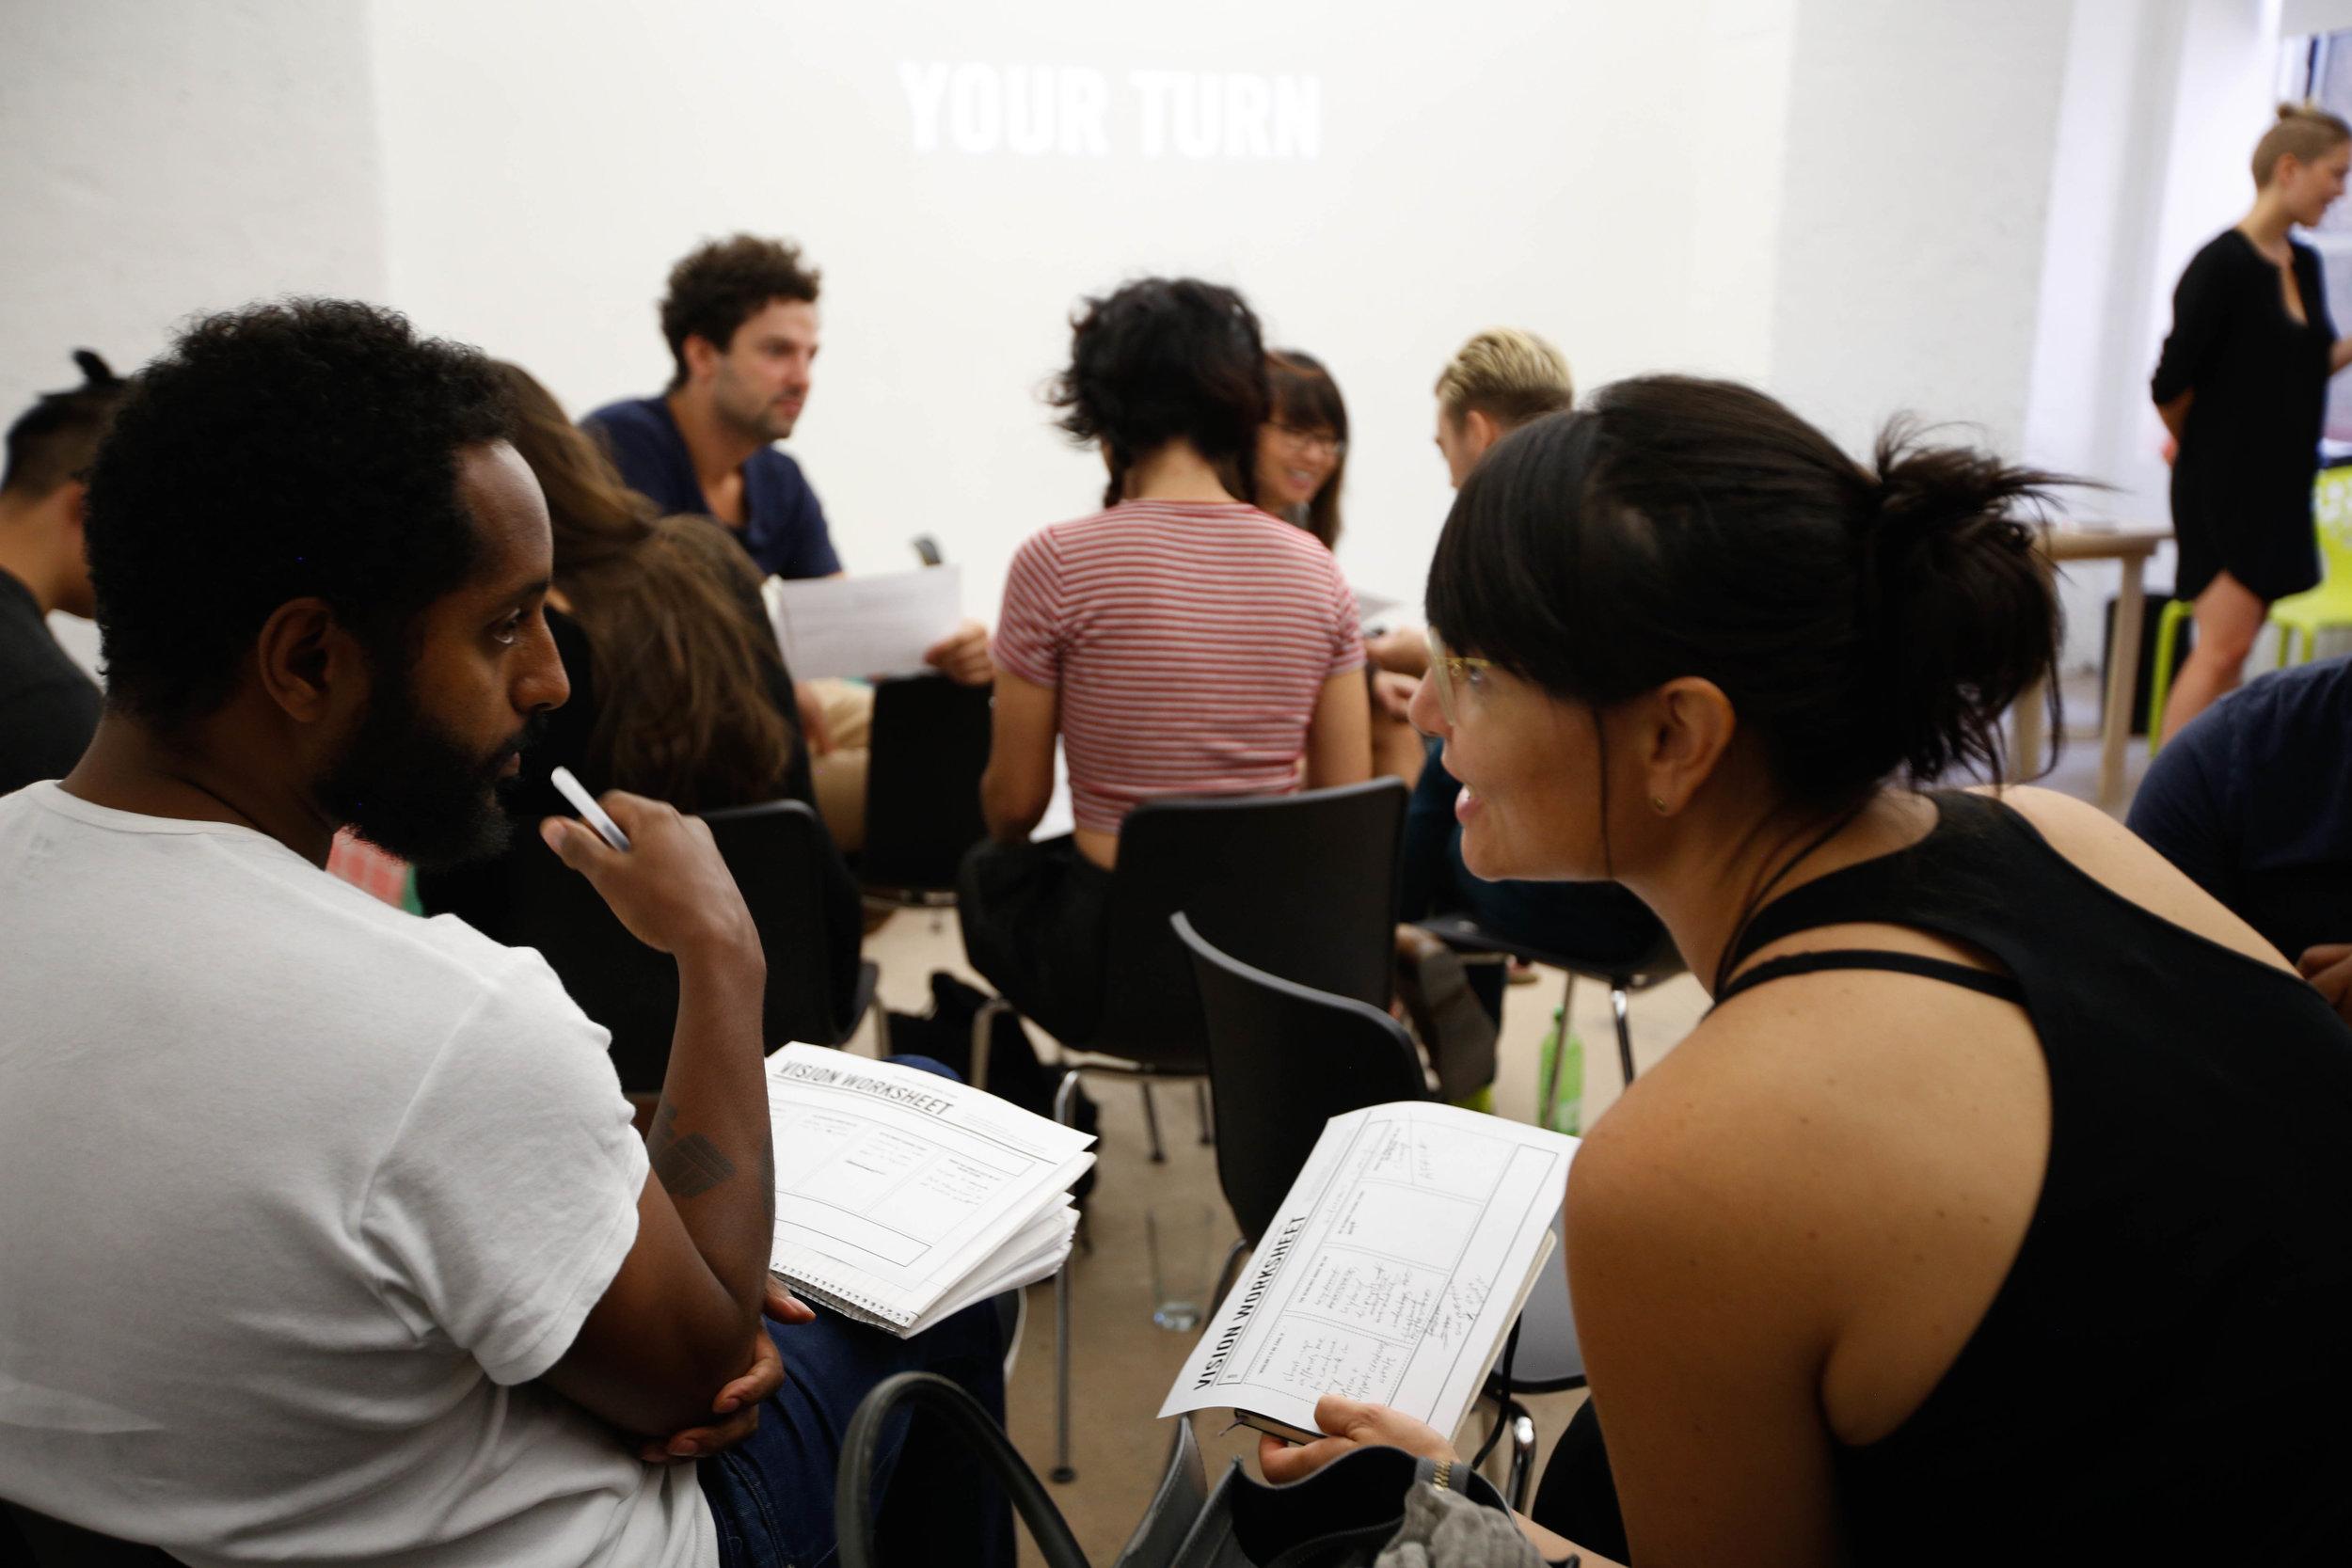 Workshop participants in conversation. Links to Program Overview.